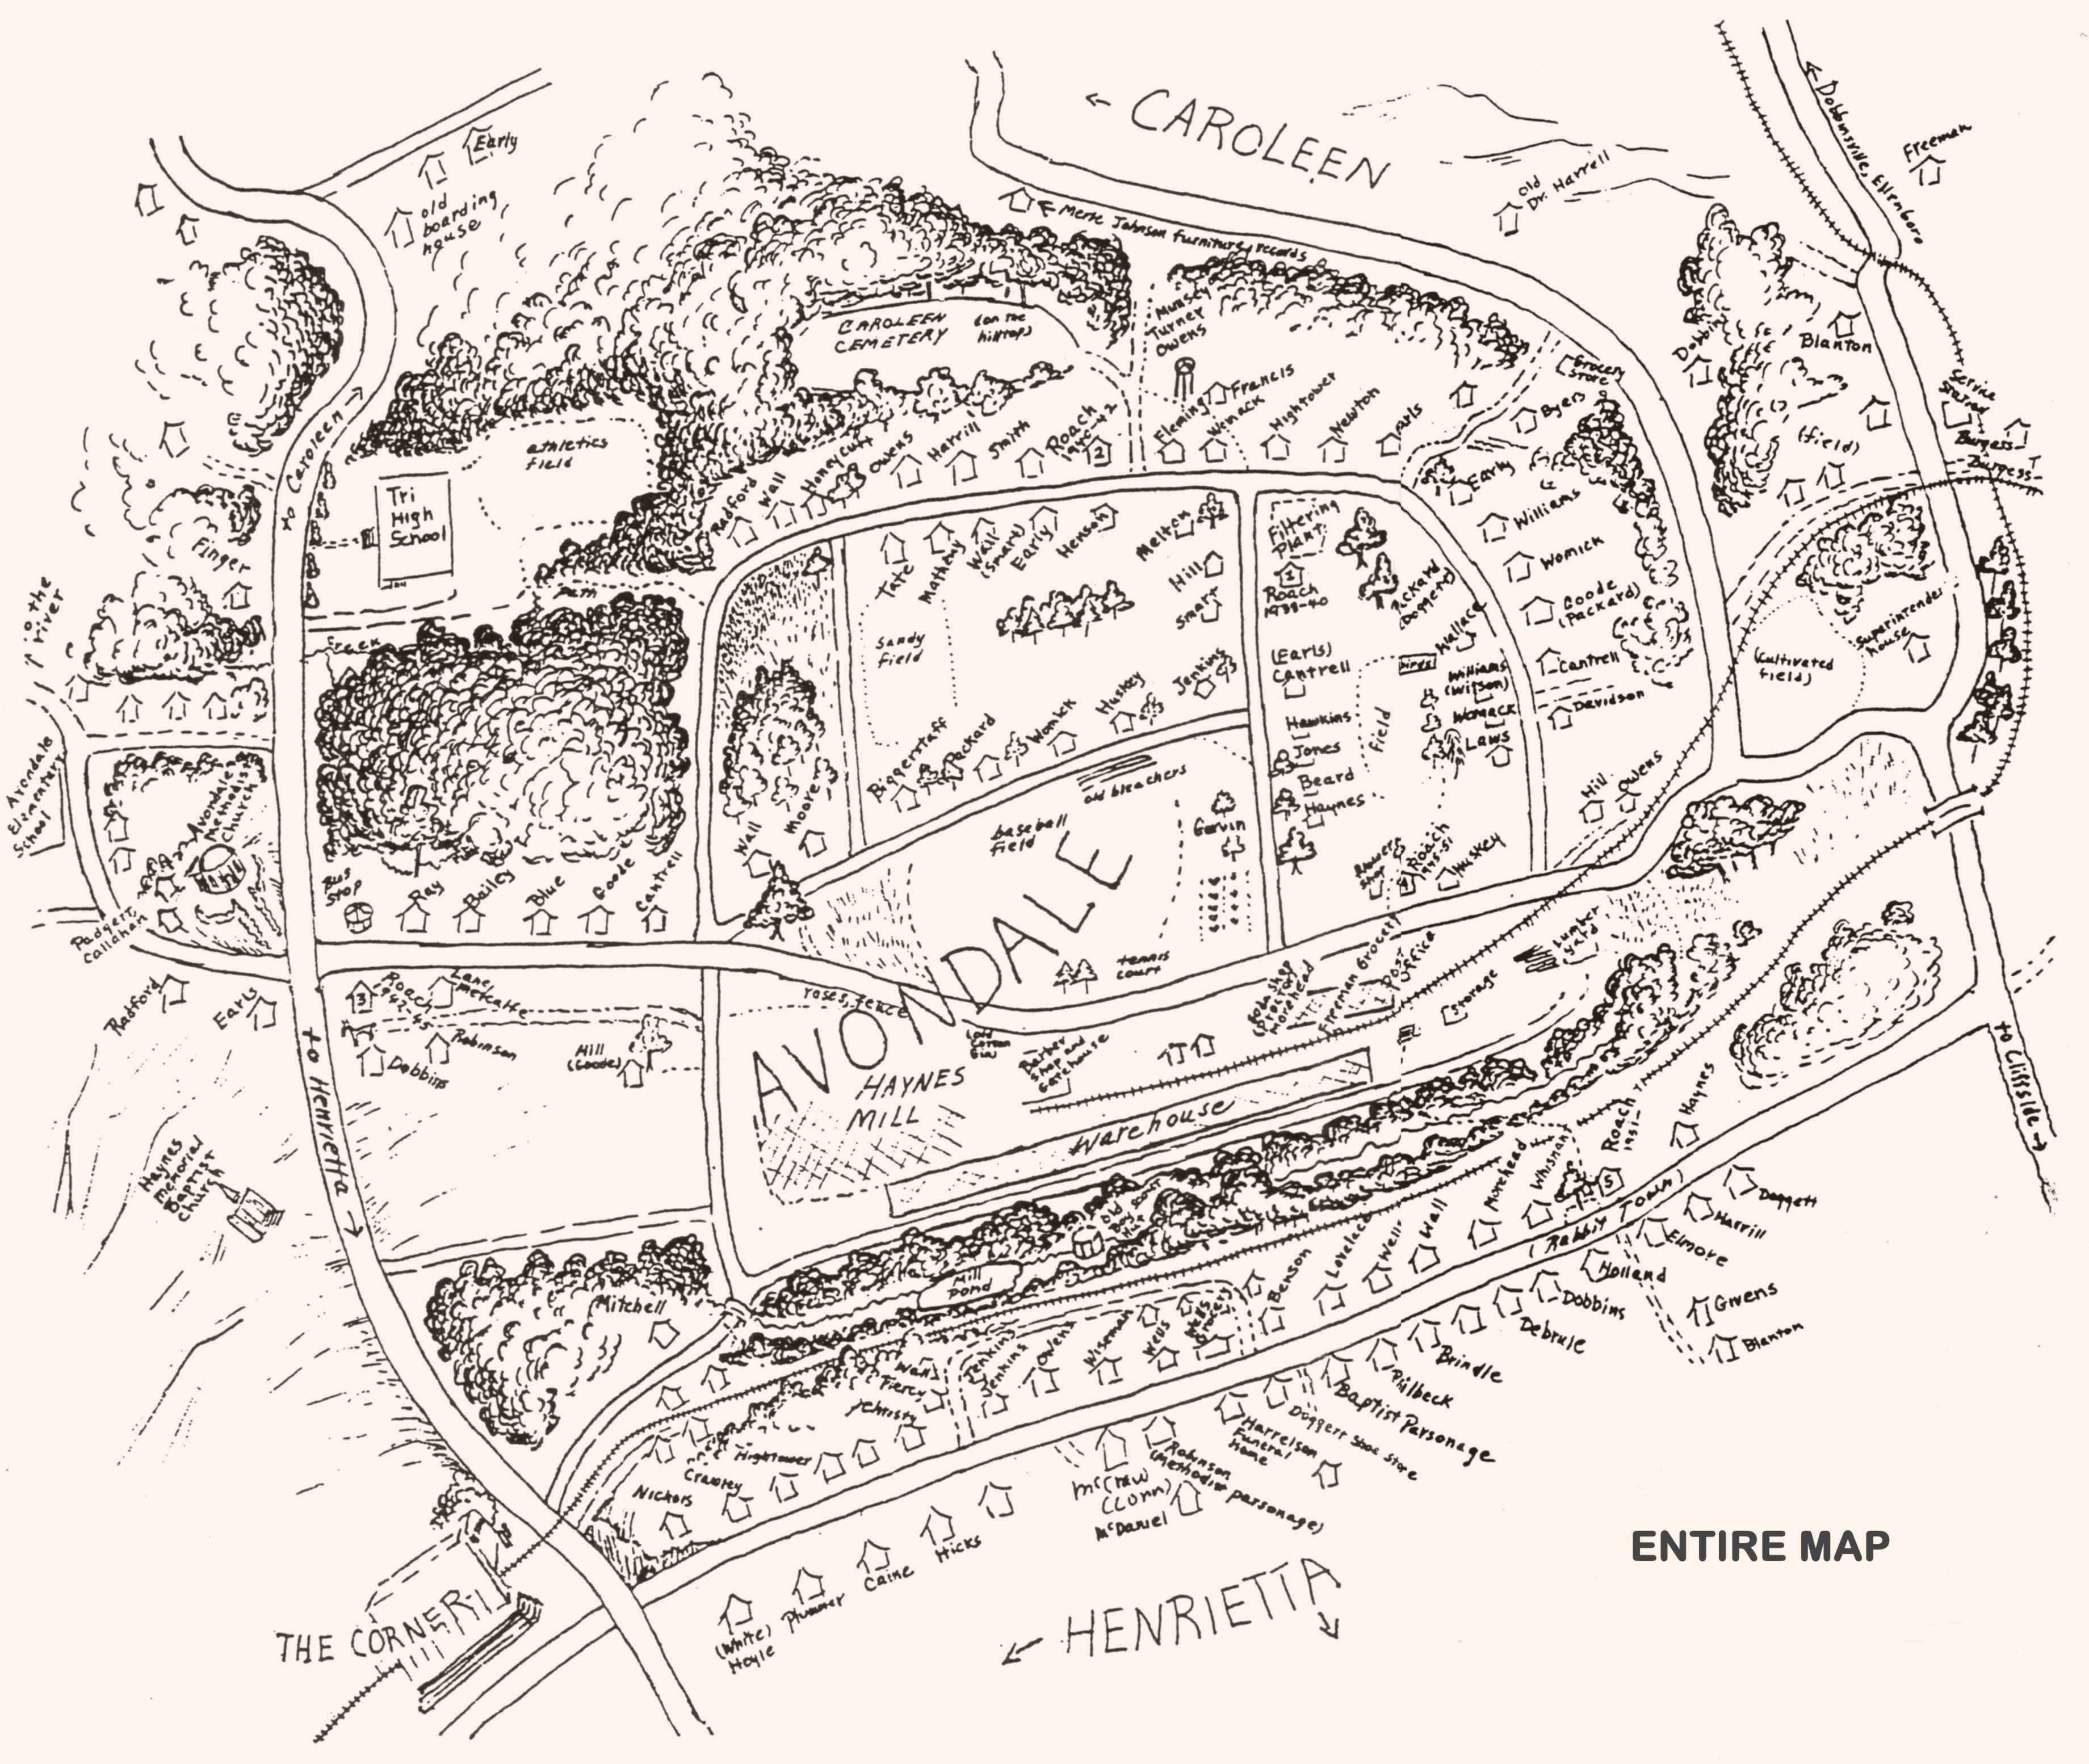 Large drawn map of tiny village of Avondale